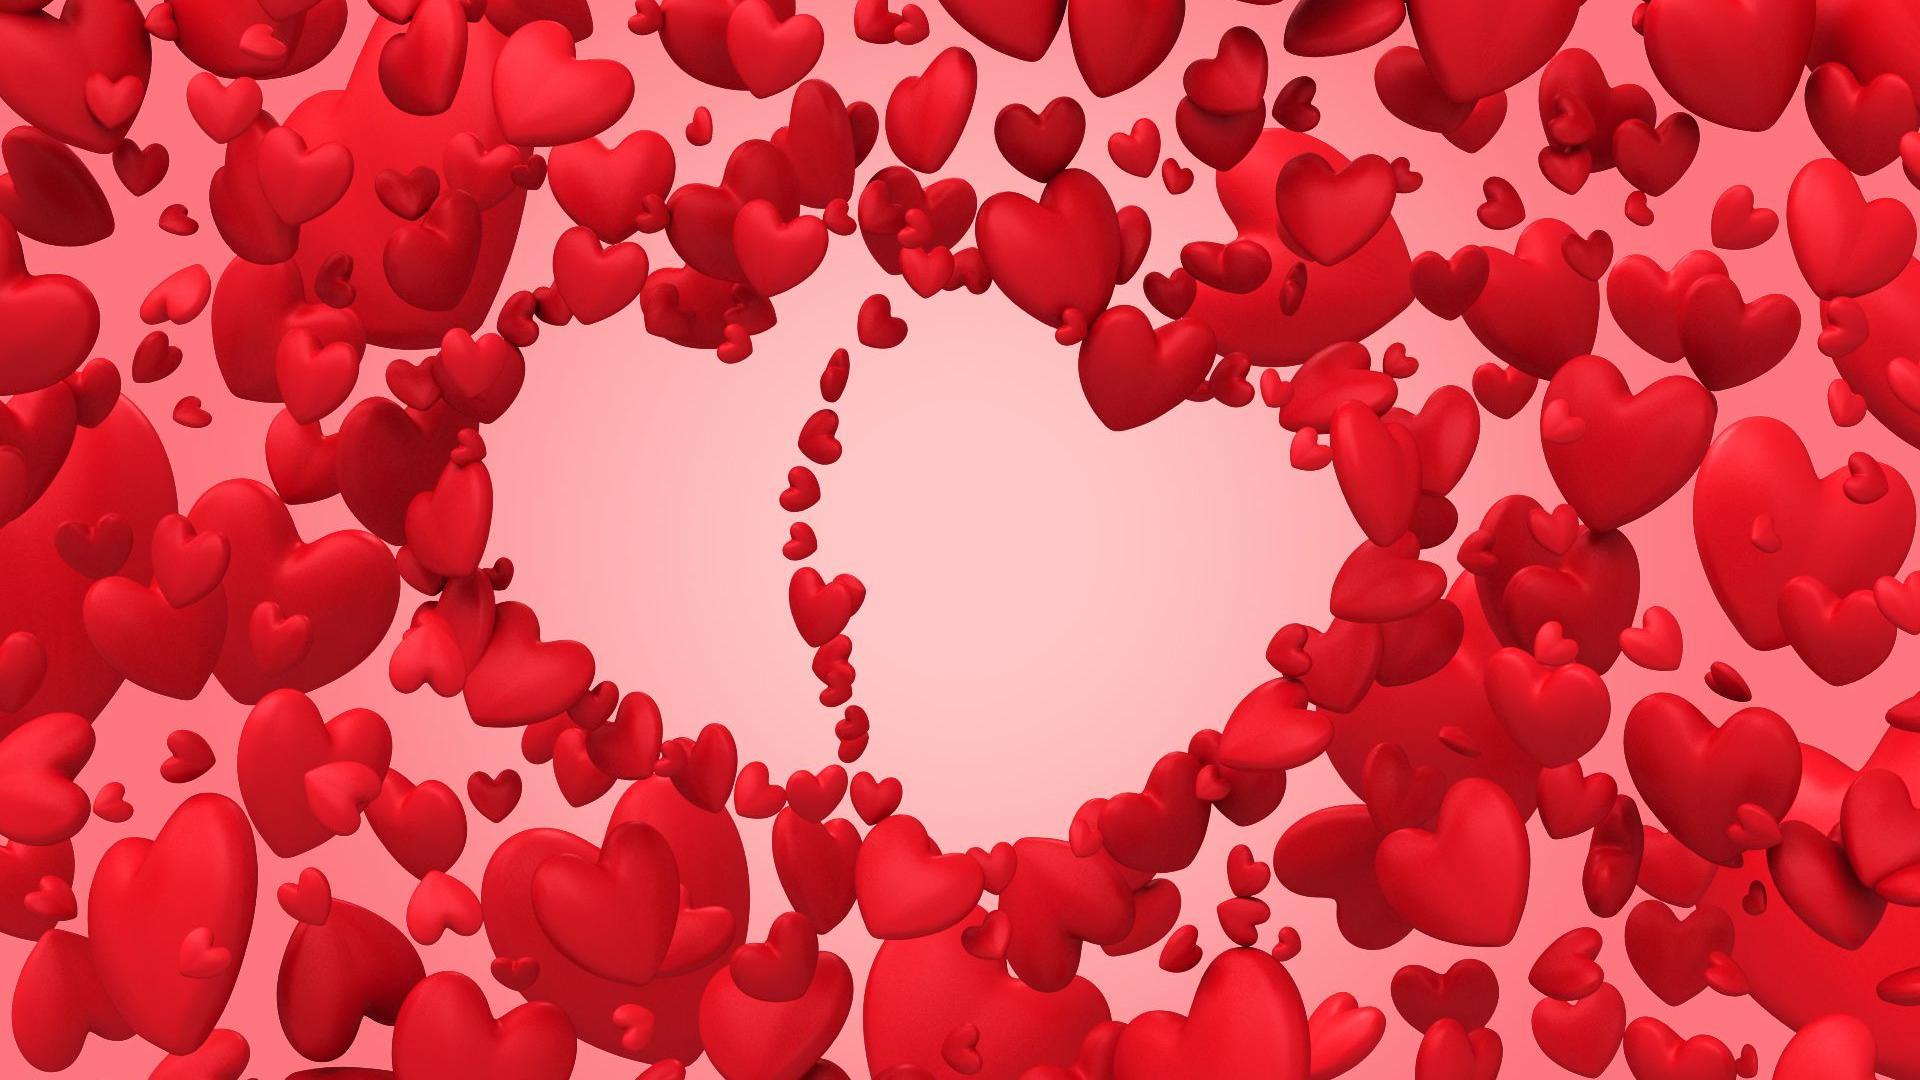 happy valentine\u0027s day hd wallpapers for pc, desktop \u0026 mobile {freedownload \u2013 valentine day wallpapers